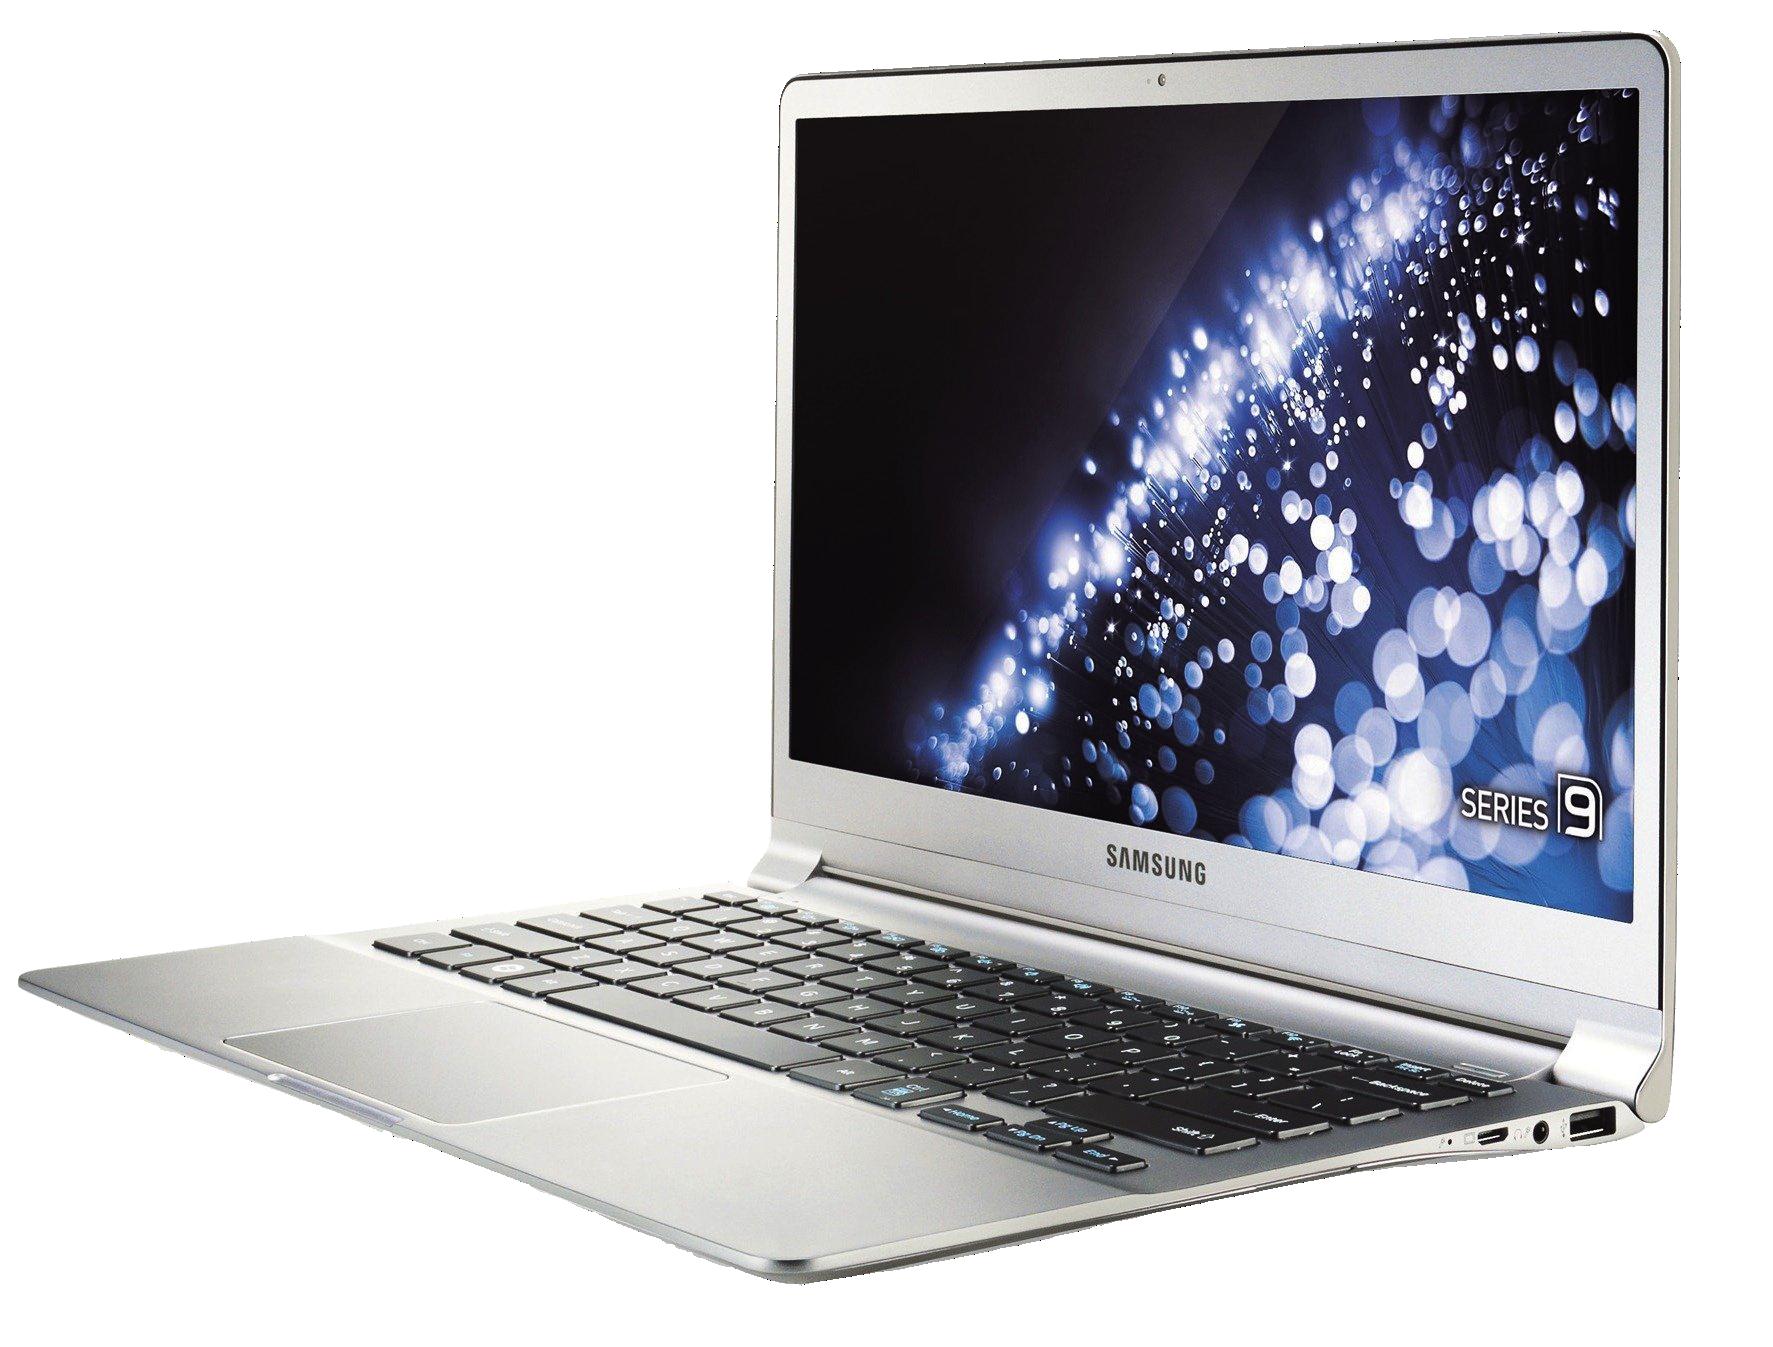 Laptop notebook PNG image - Free PNG Laptop